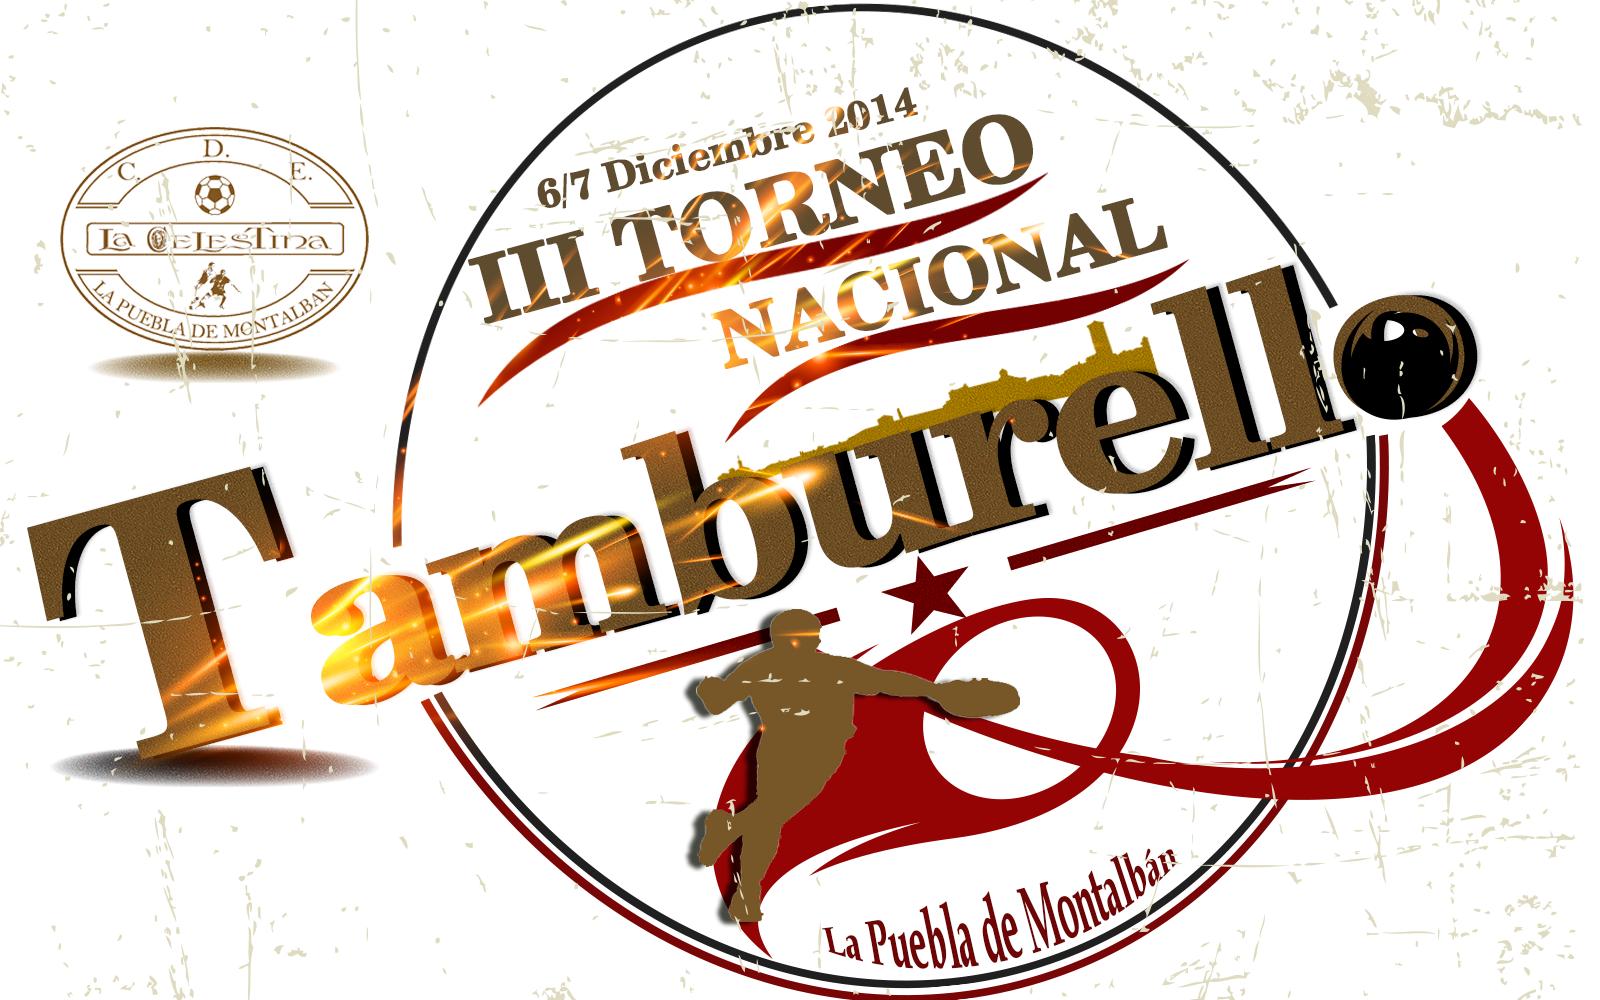 http://www.cdelacelestina.com/2014/12/gruposhorarios-torneo-nacional.html